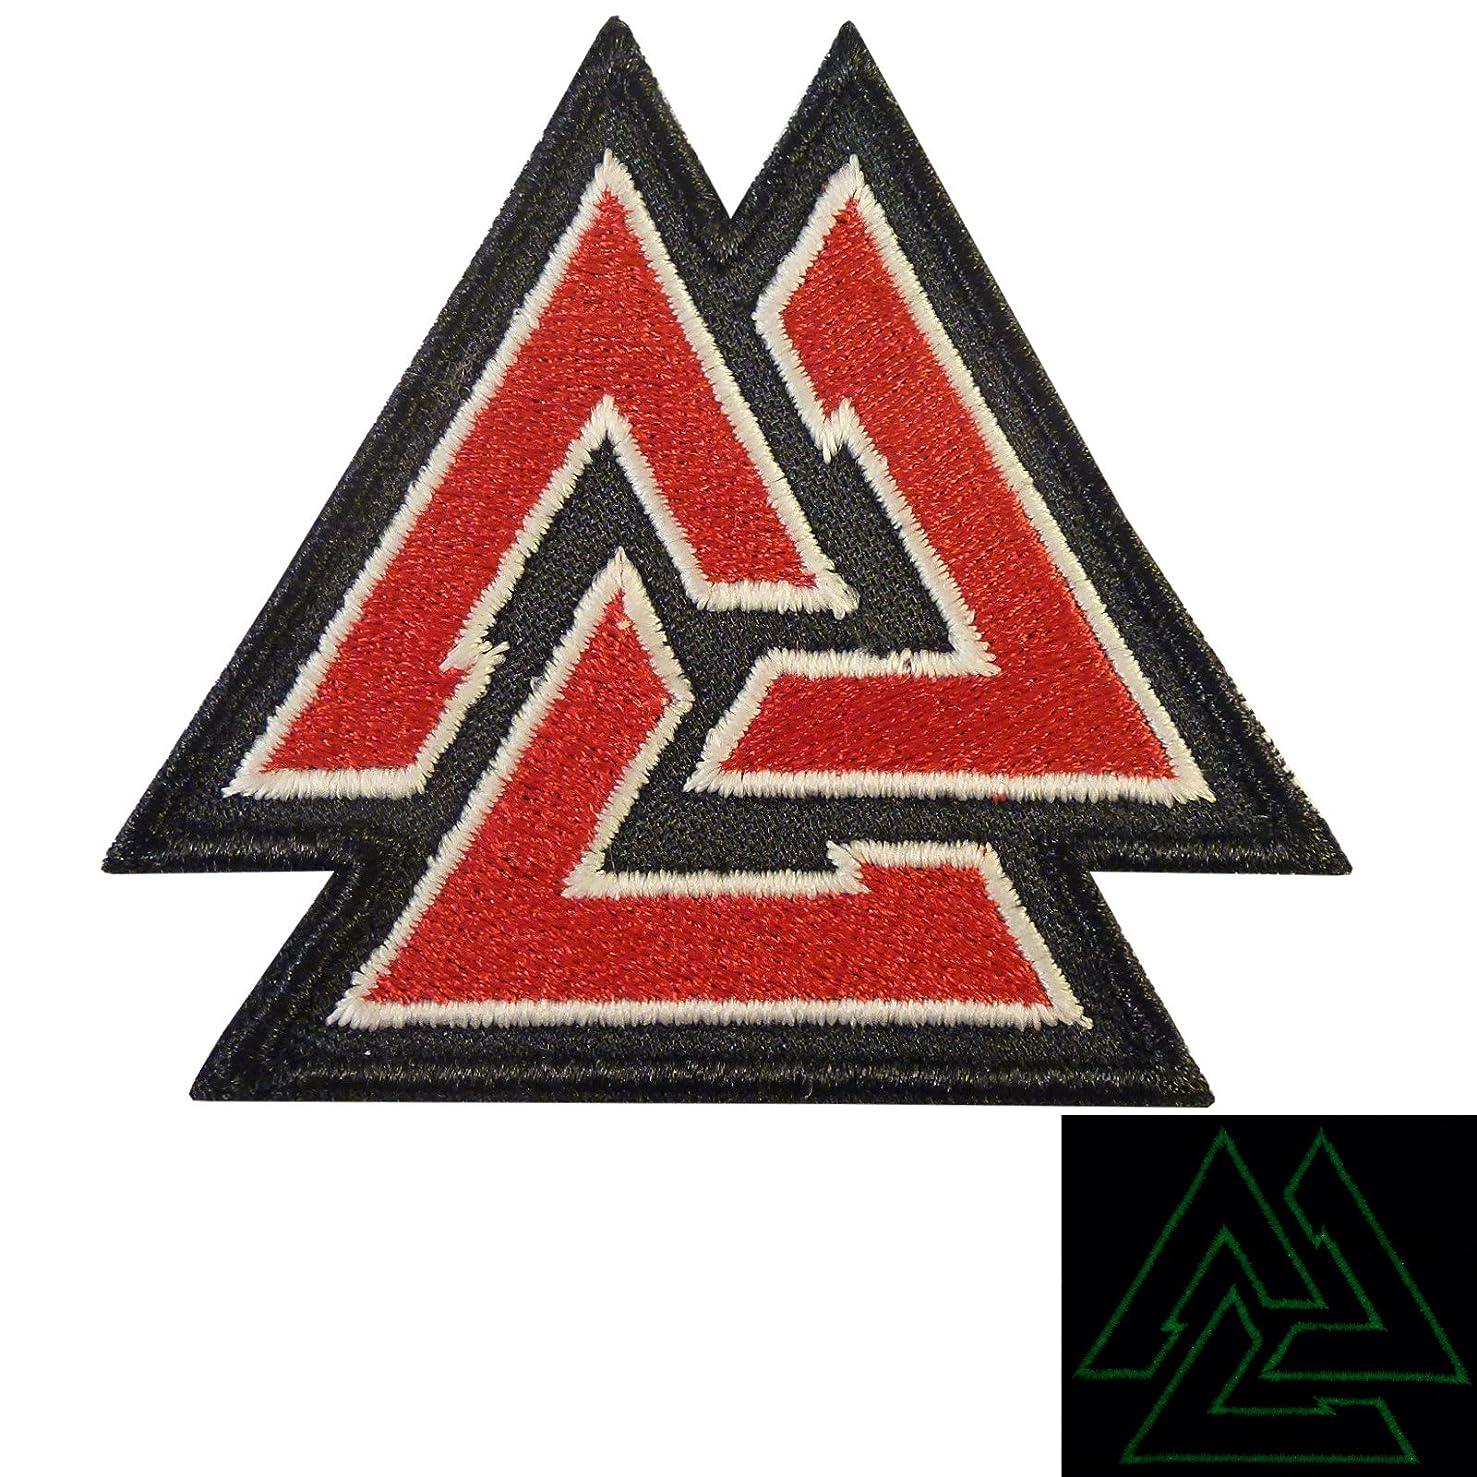 LEGEEON Glow Dark Valknut Viking Norse Rune Morale Tactical Sew Iron on Patch